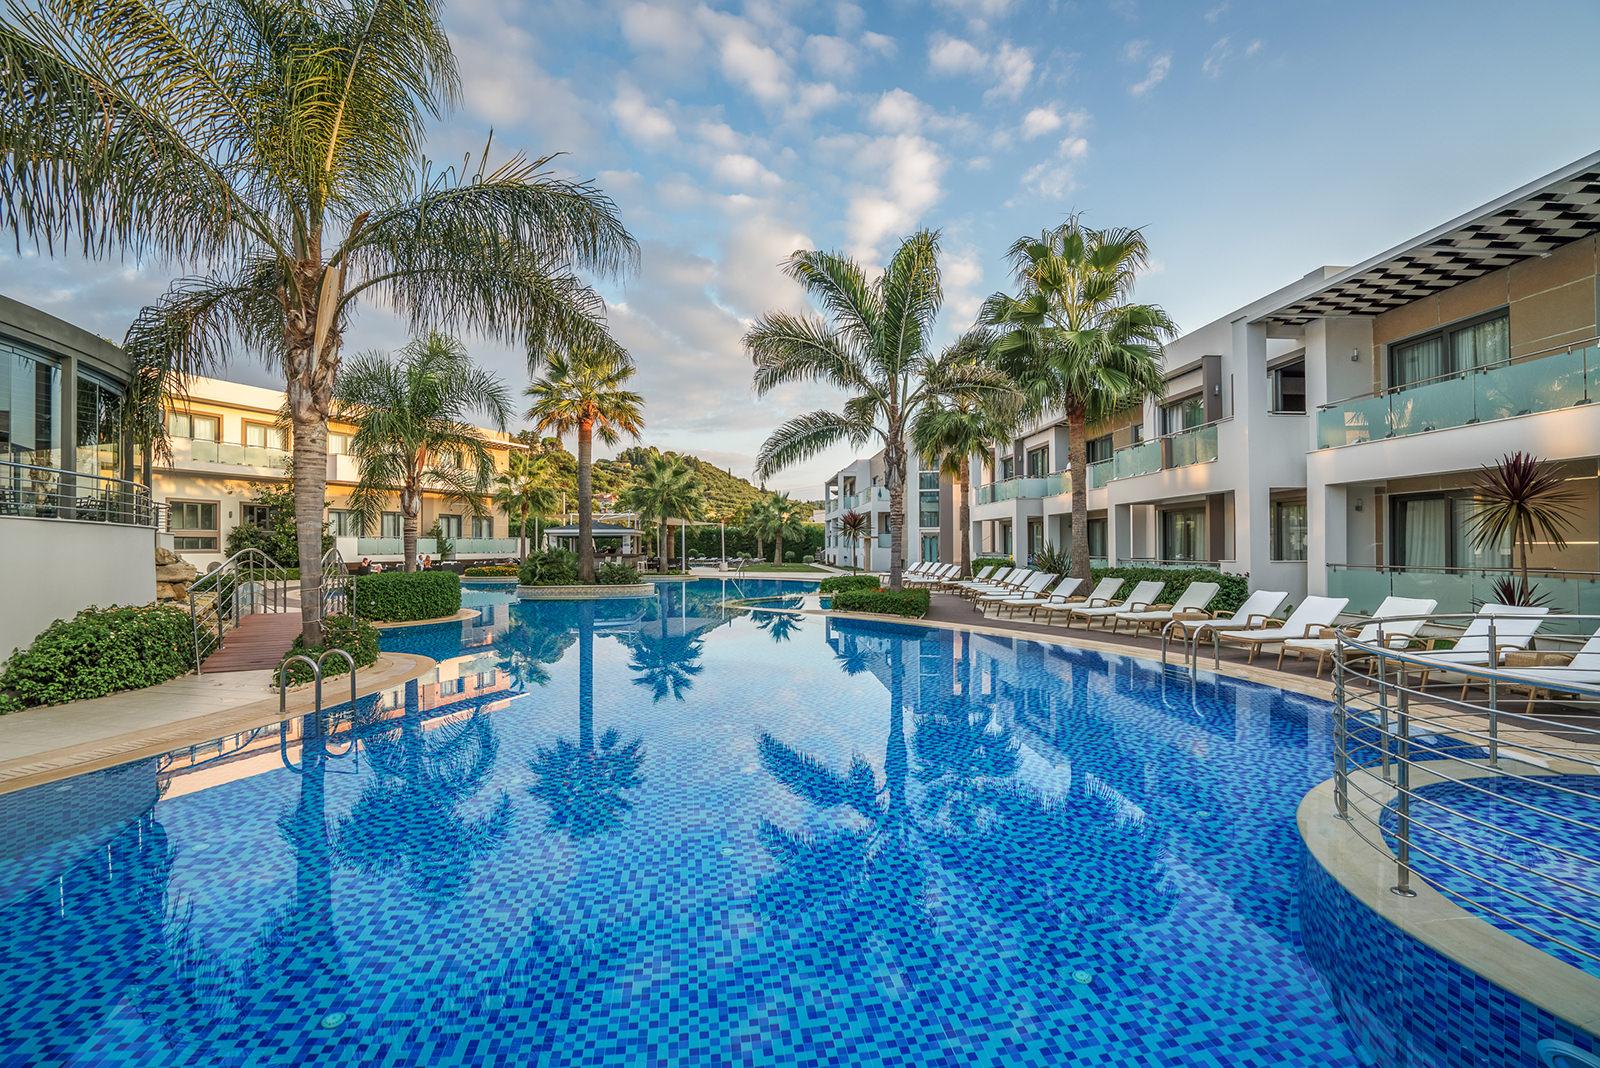 The Lesante Luxury Hotel Amp Spa Cond 233 Nast Johansens